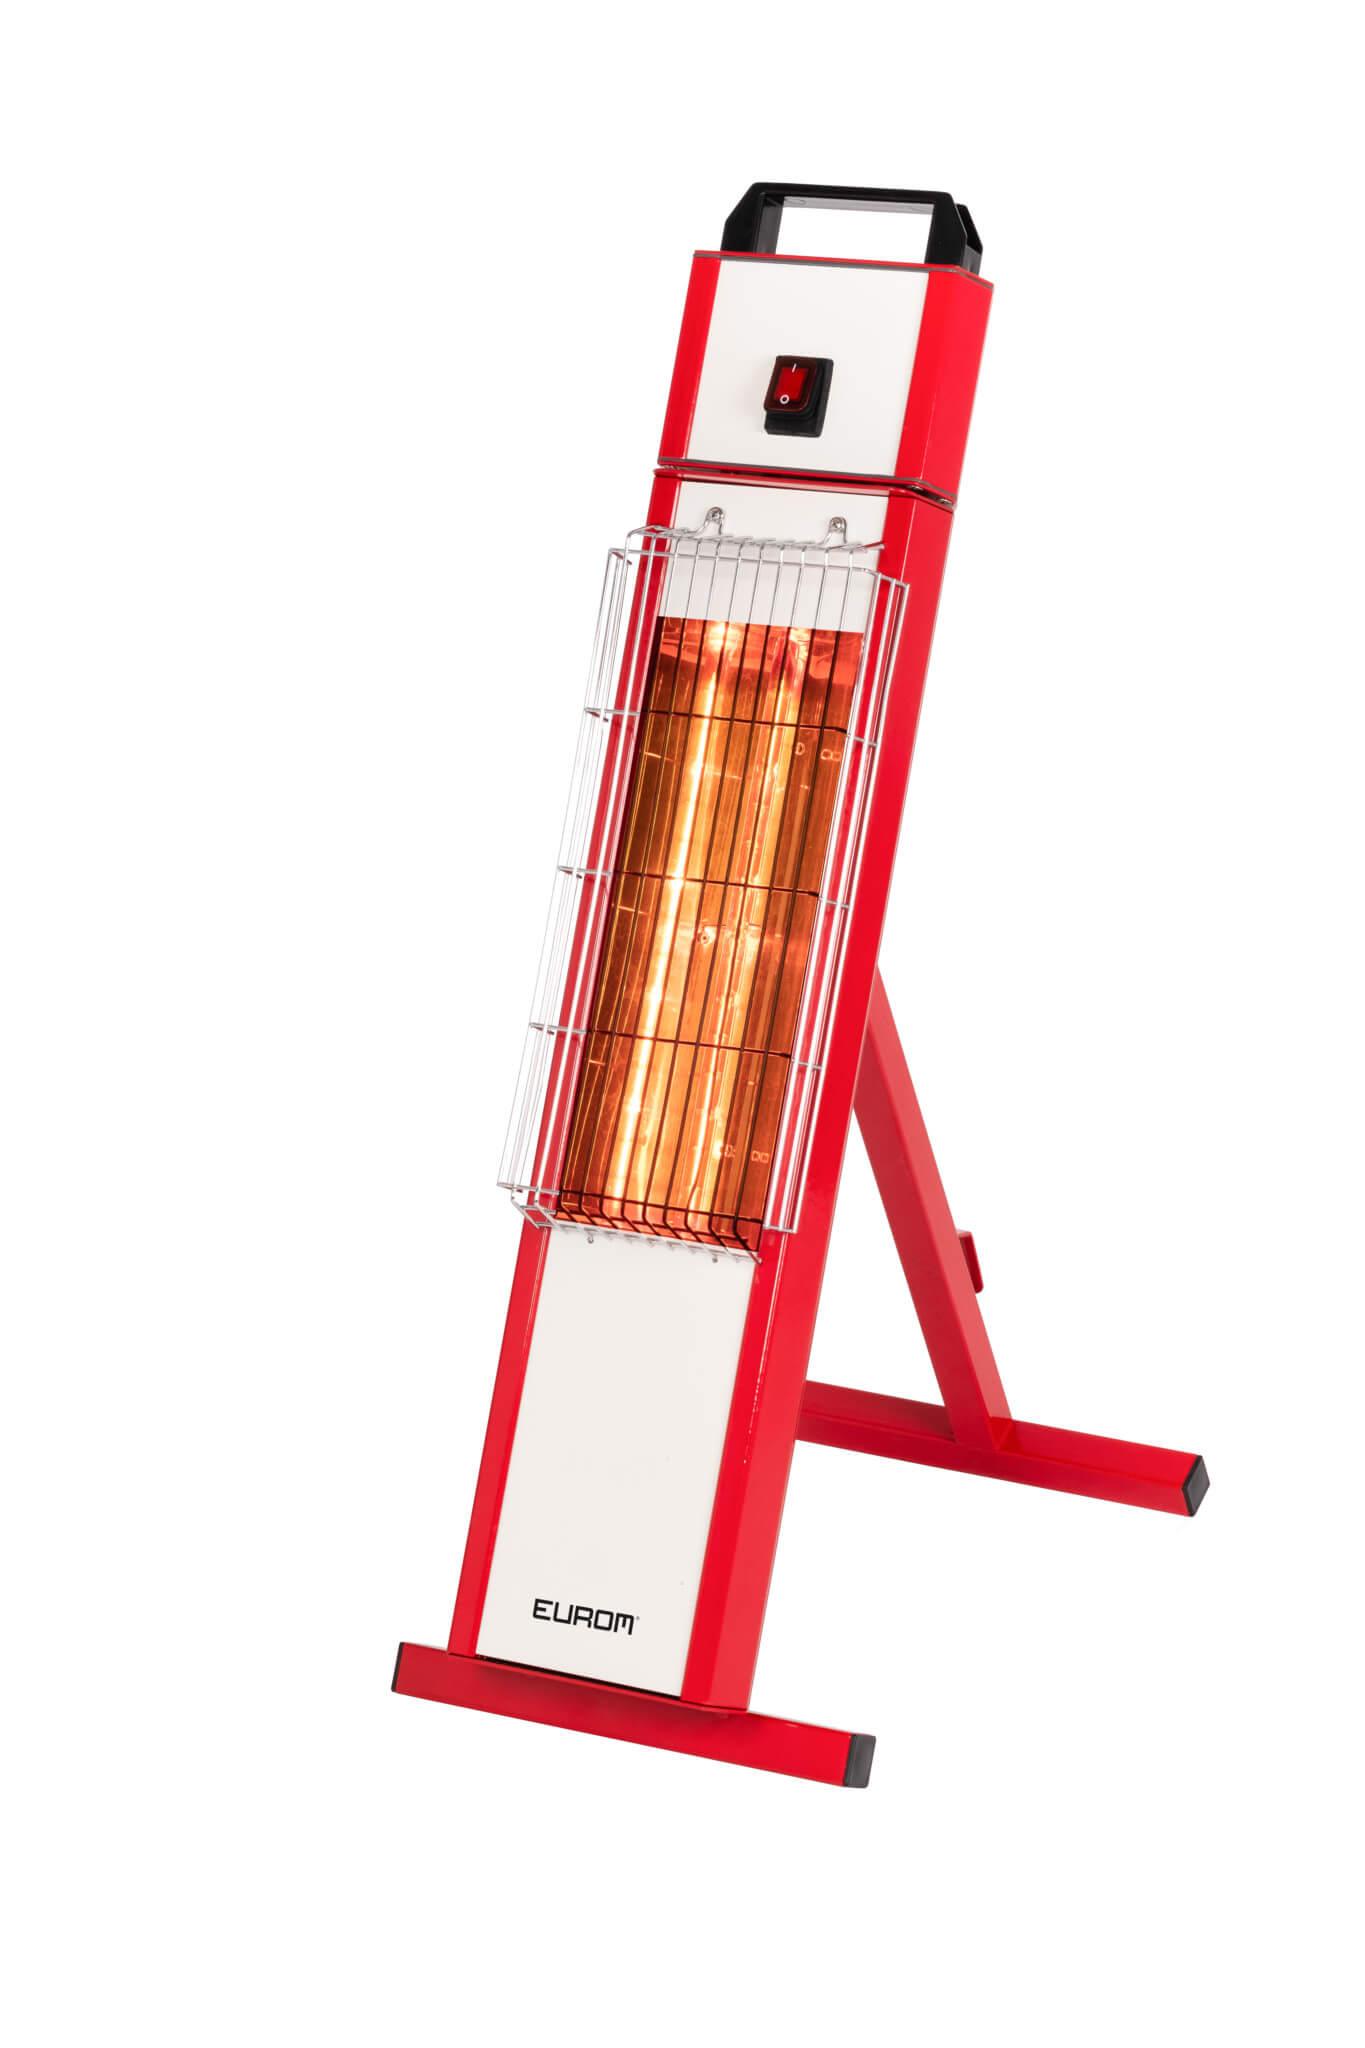 Eurom Golden Draagbare Kachel 1000 W | Rode werkplaatskachel